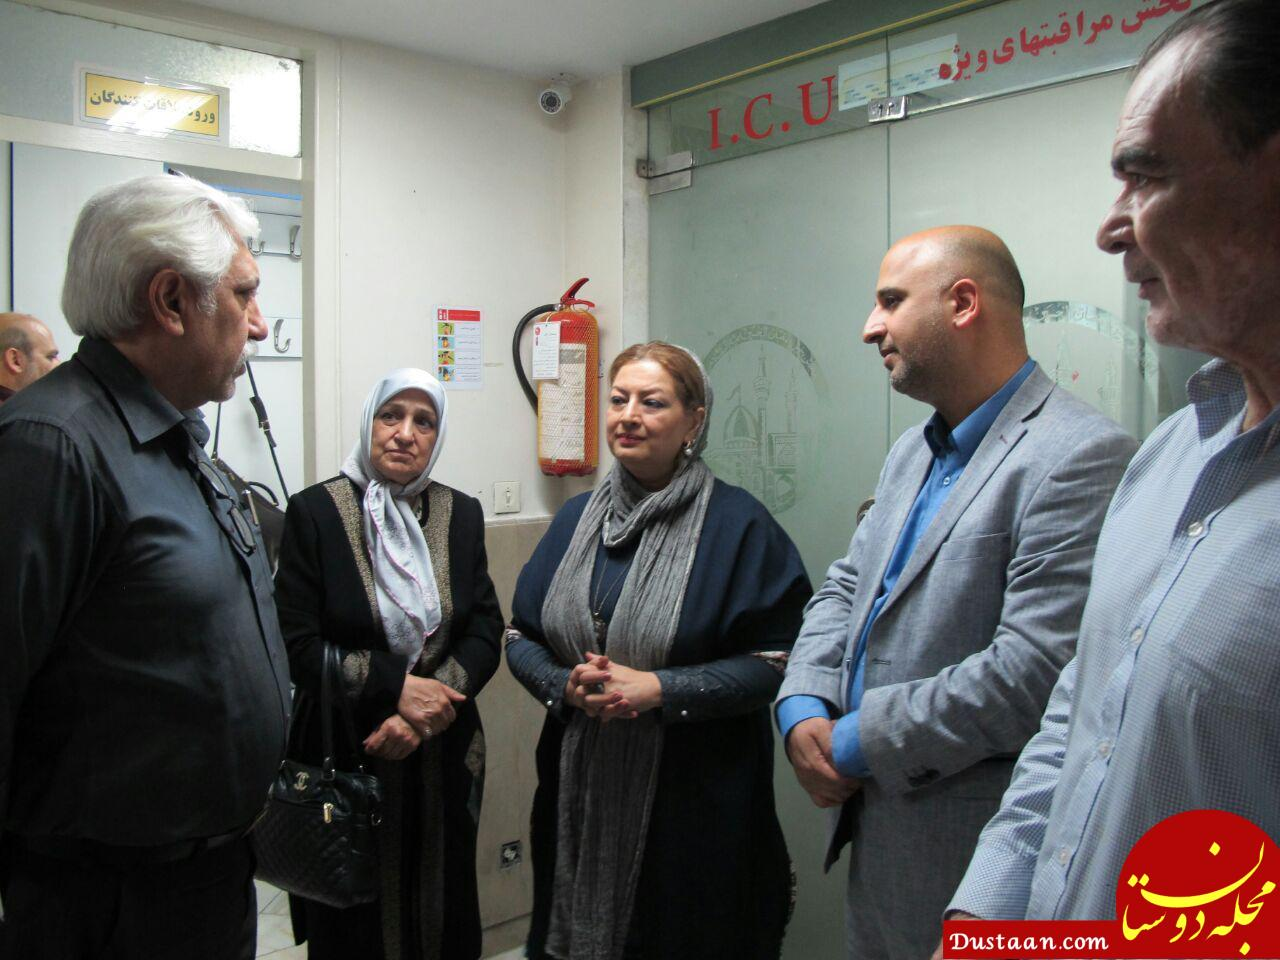 www.dustaan.com حسین شهاب ، هنرپیشه پیشکسوت سینما درگذشت